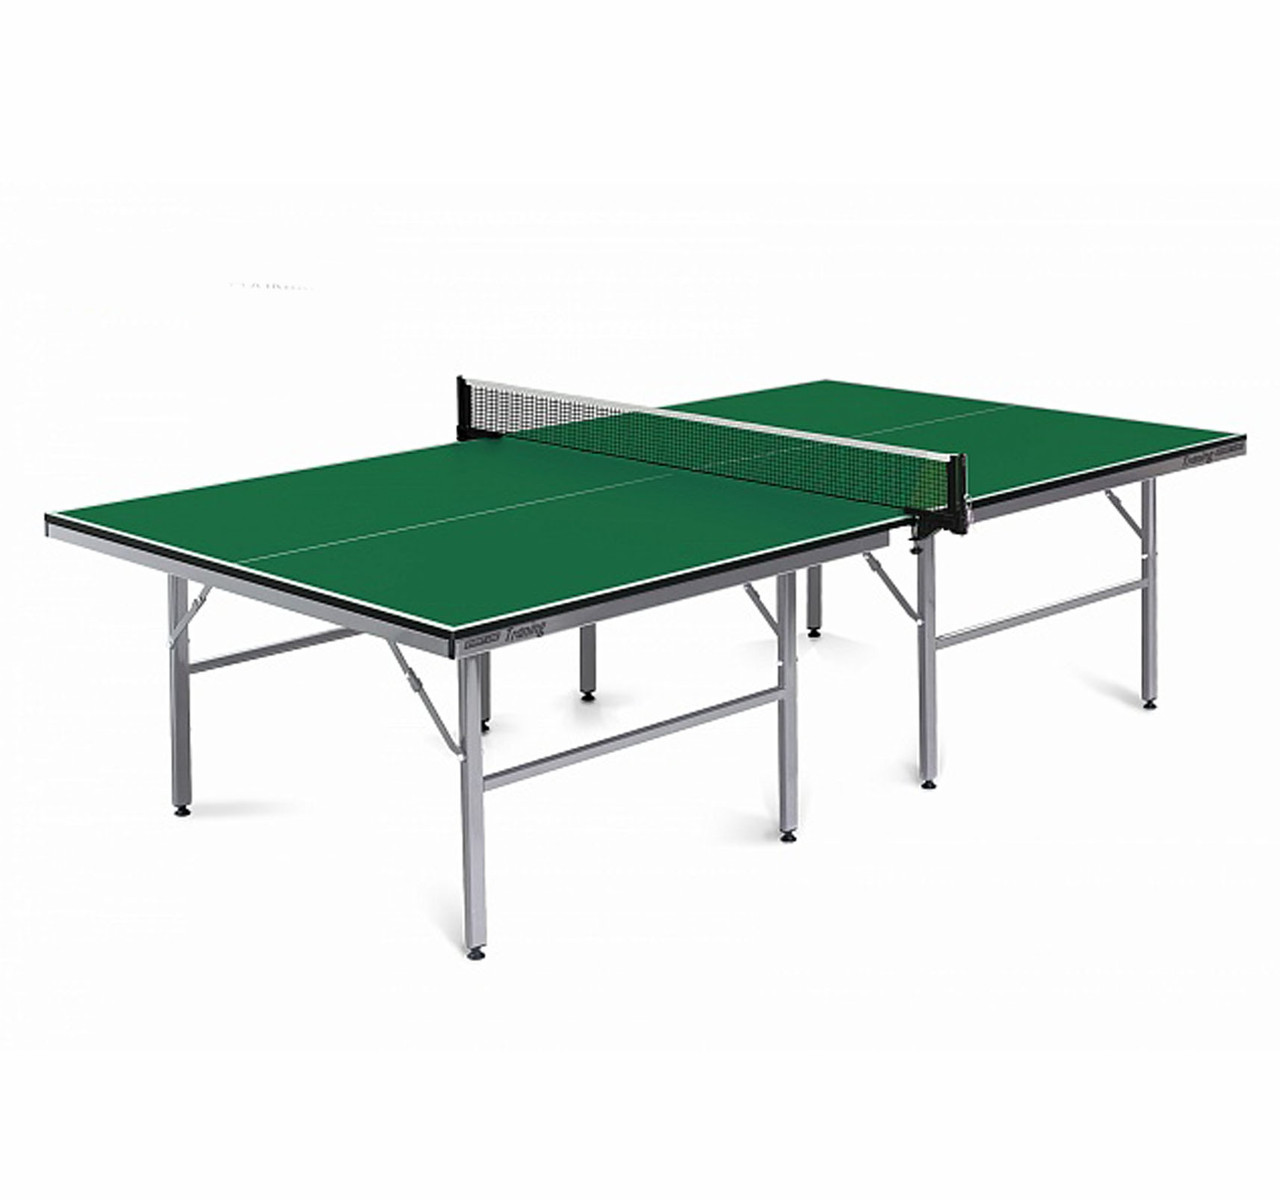 Теннисный стол Start line TRAINING Green - фото 1